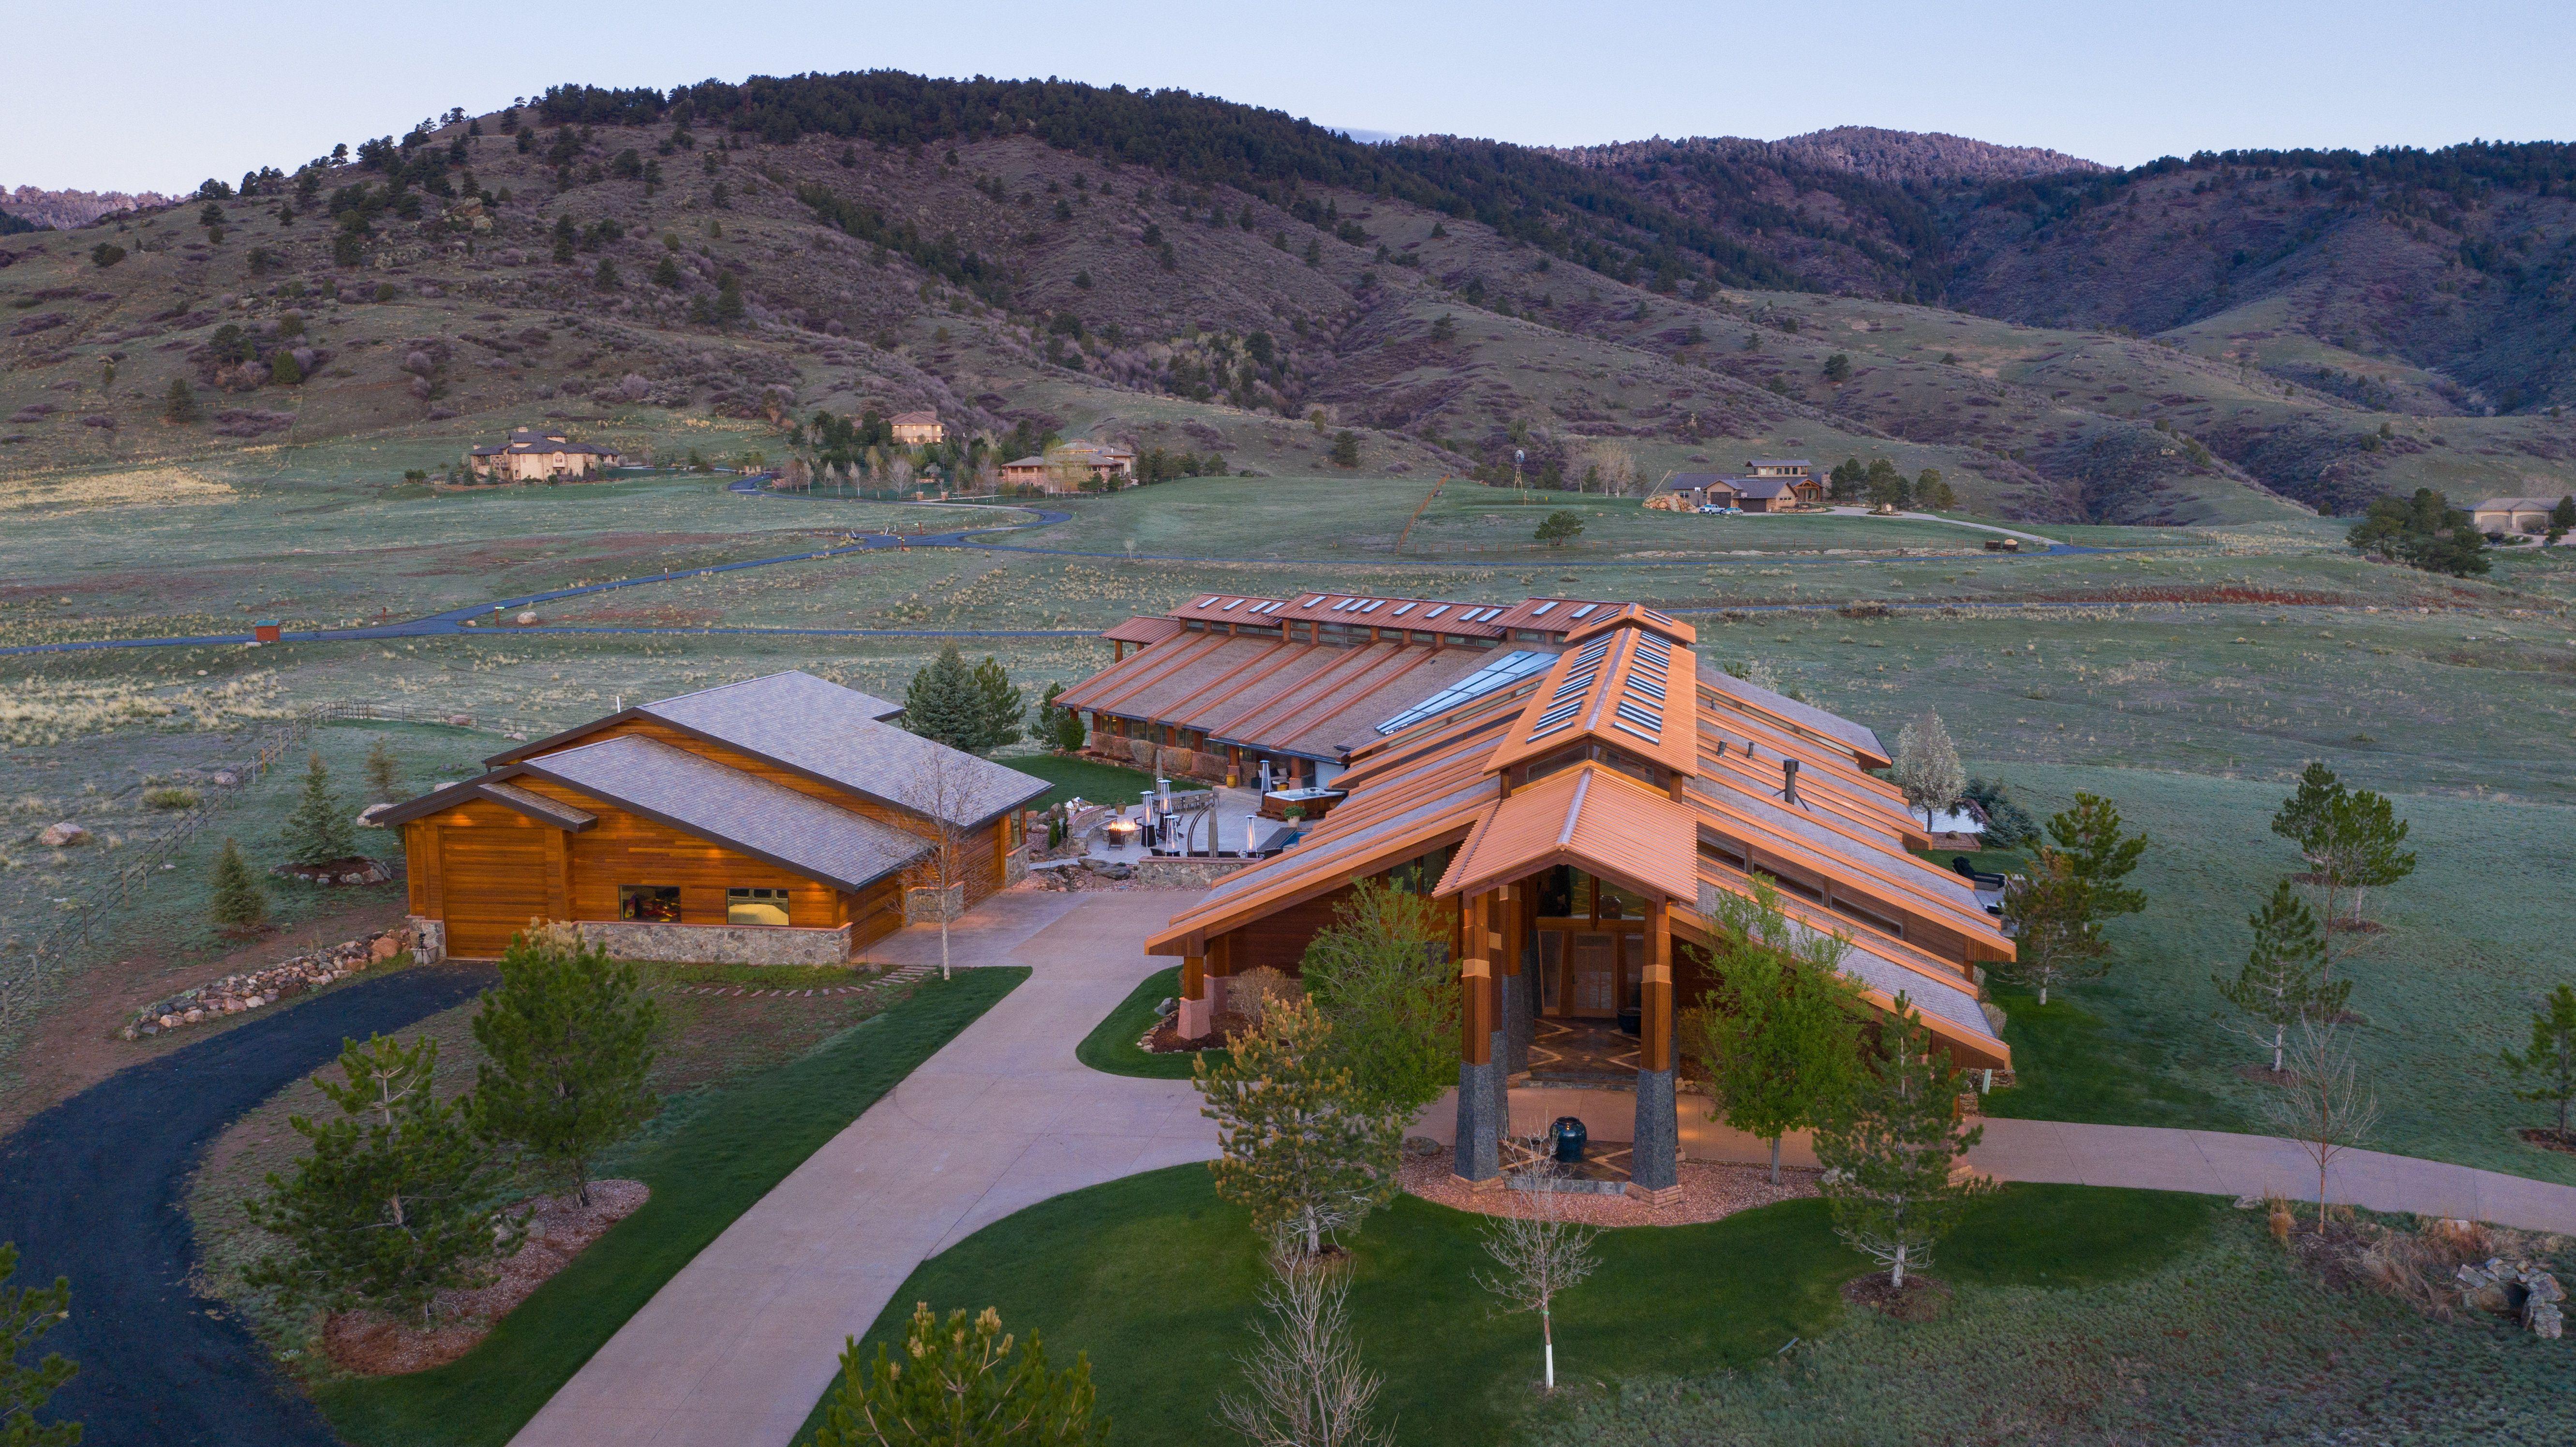 Colorado Mountain house on 35 acres asks $7M exterior views